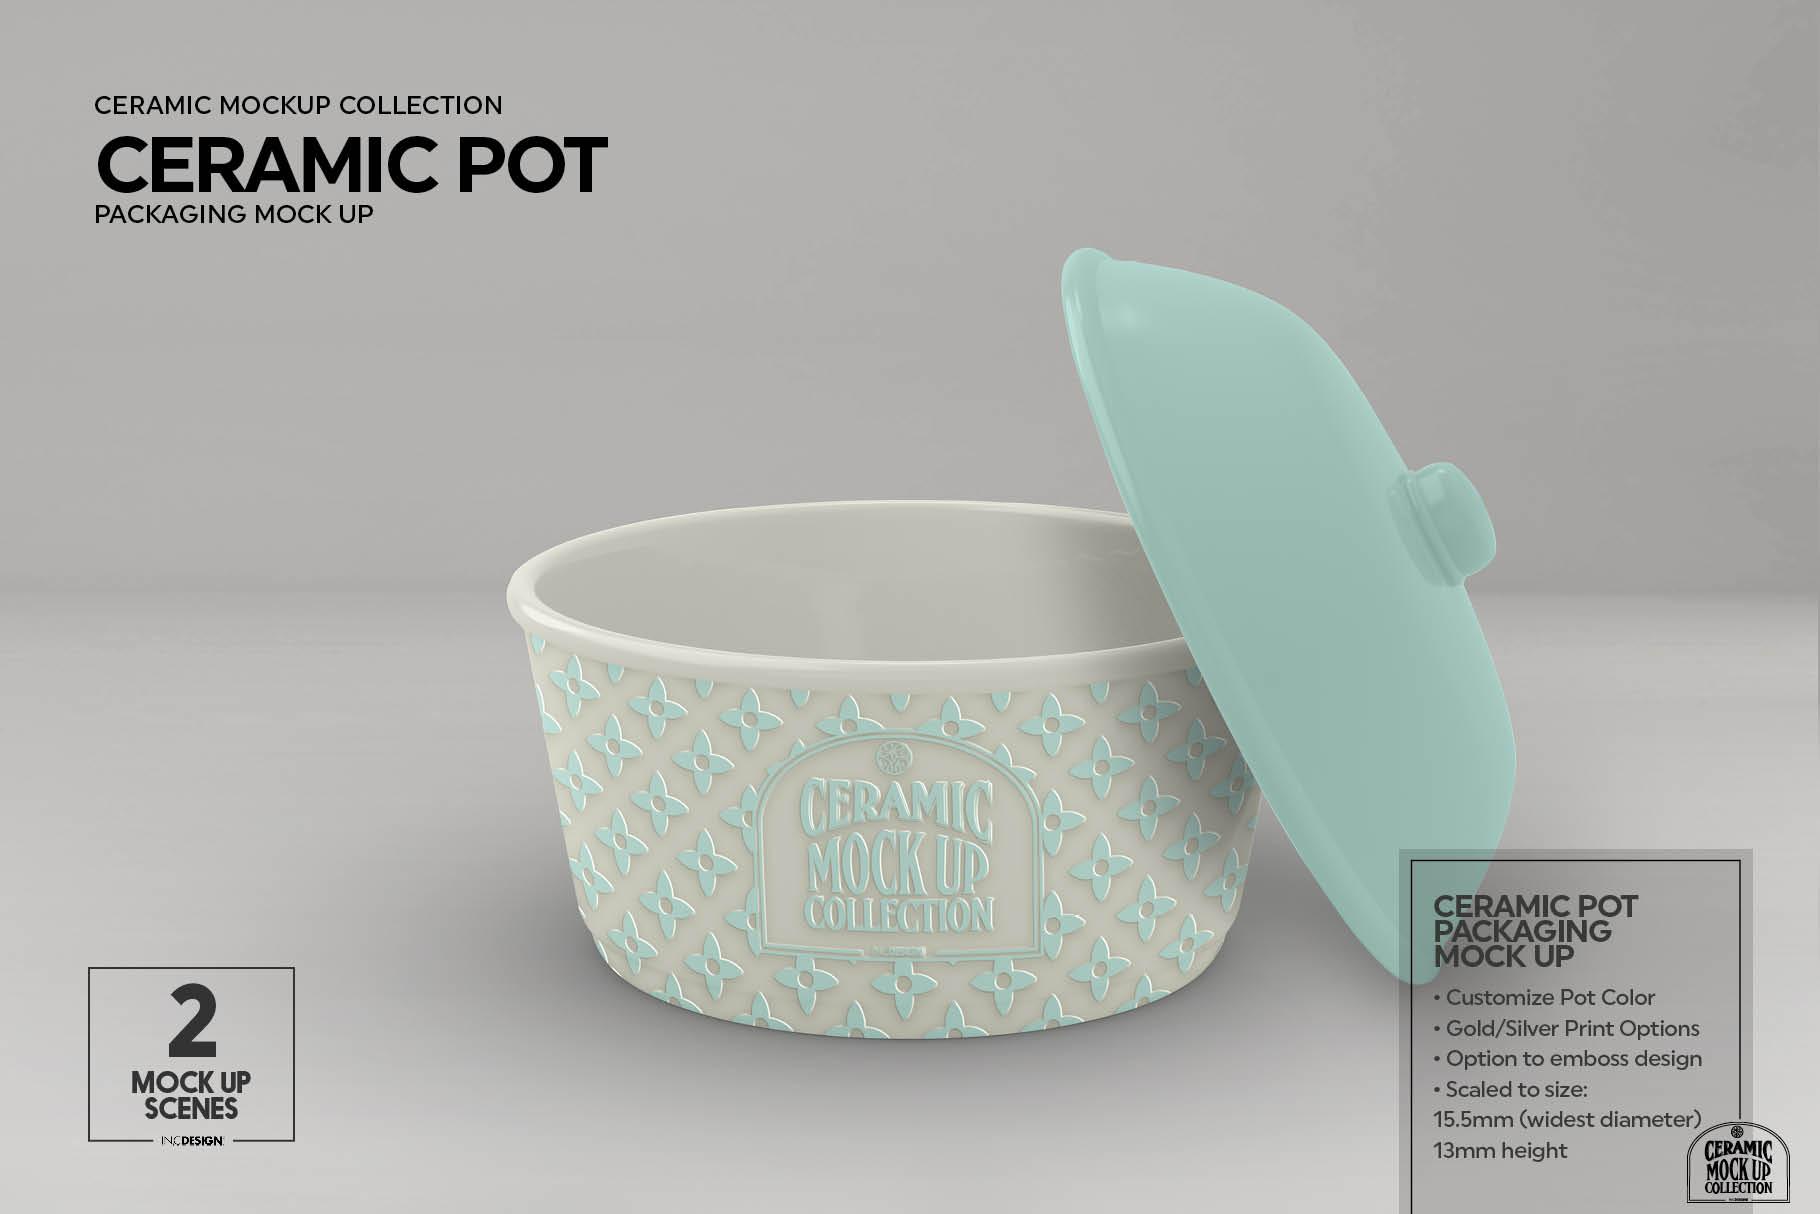 Ceramic Pot Packaging Mock Up example image 9